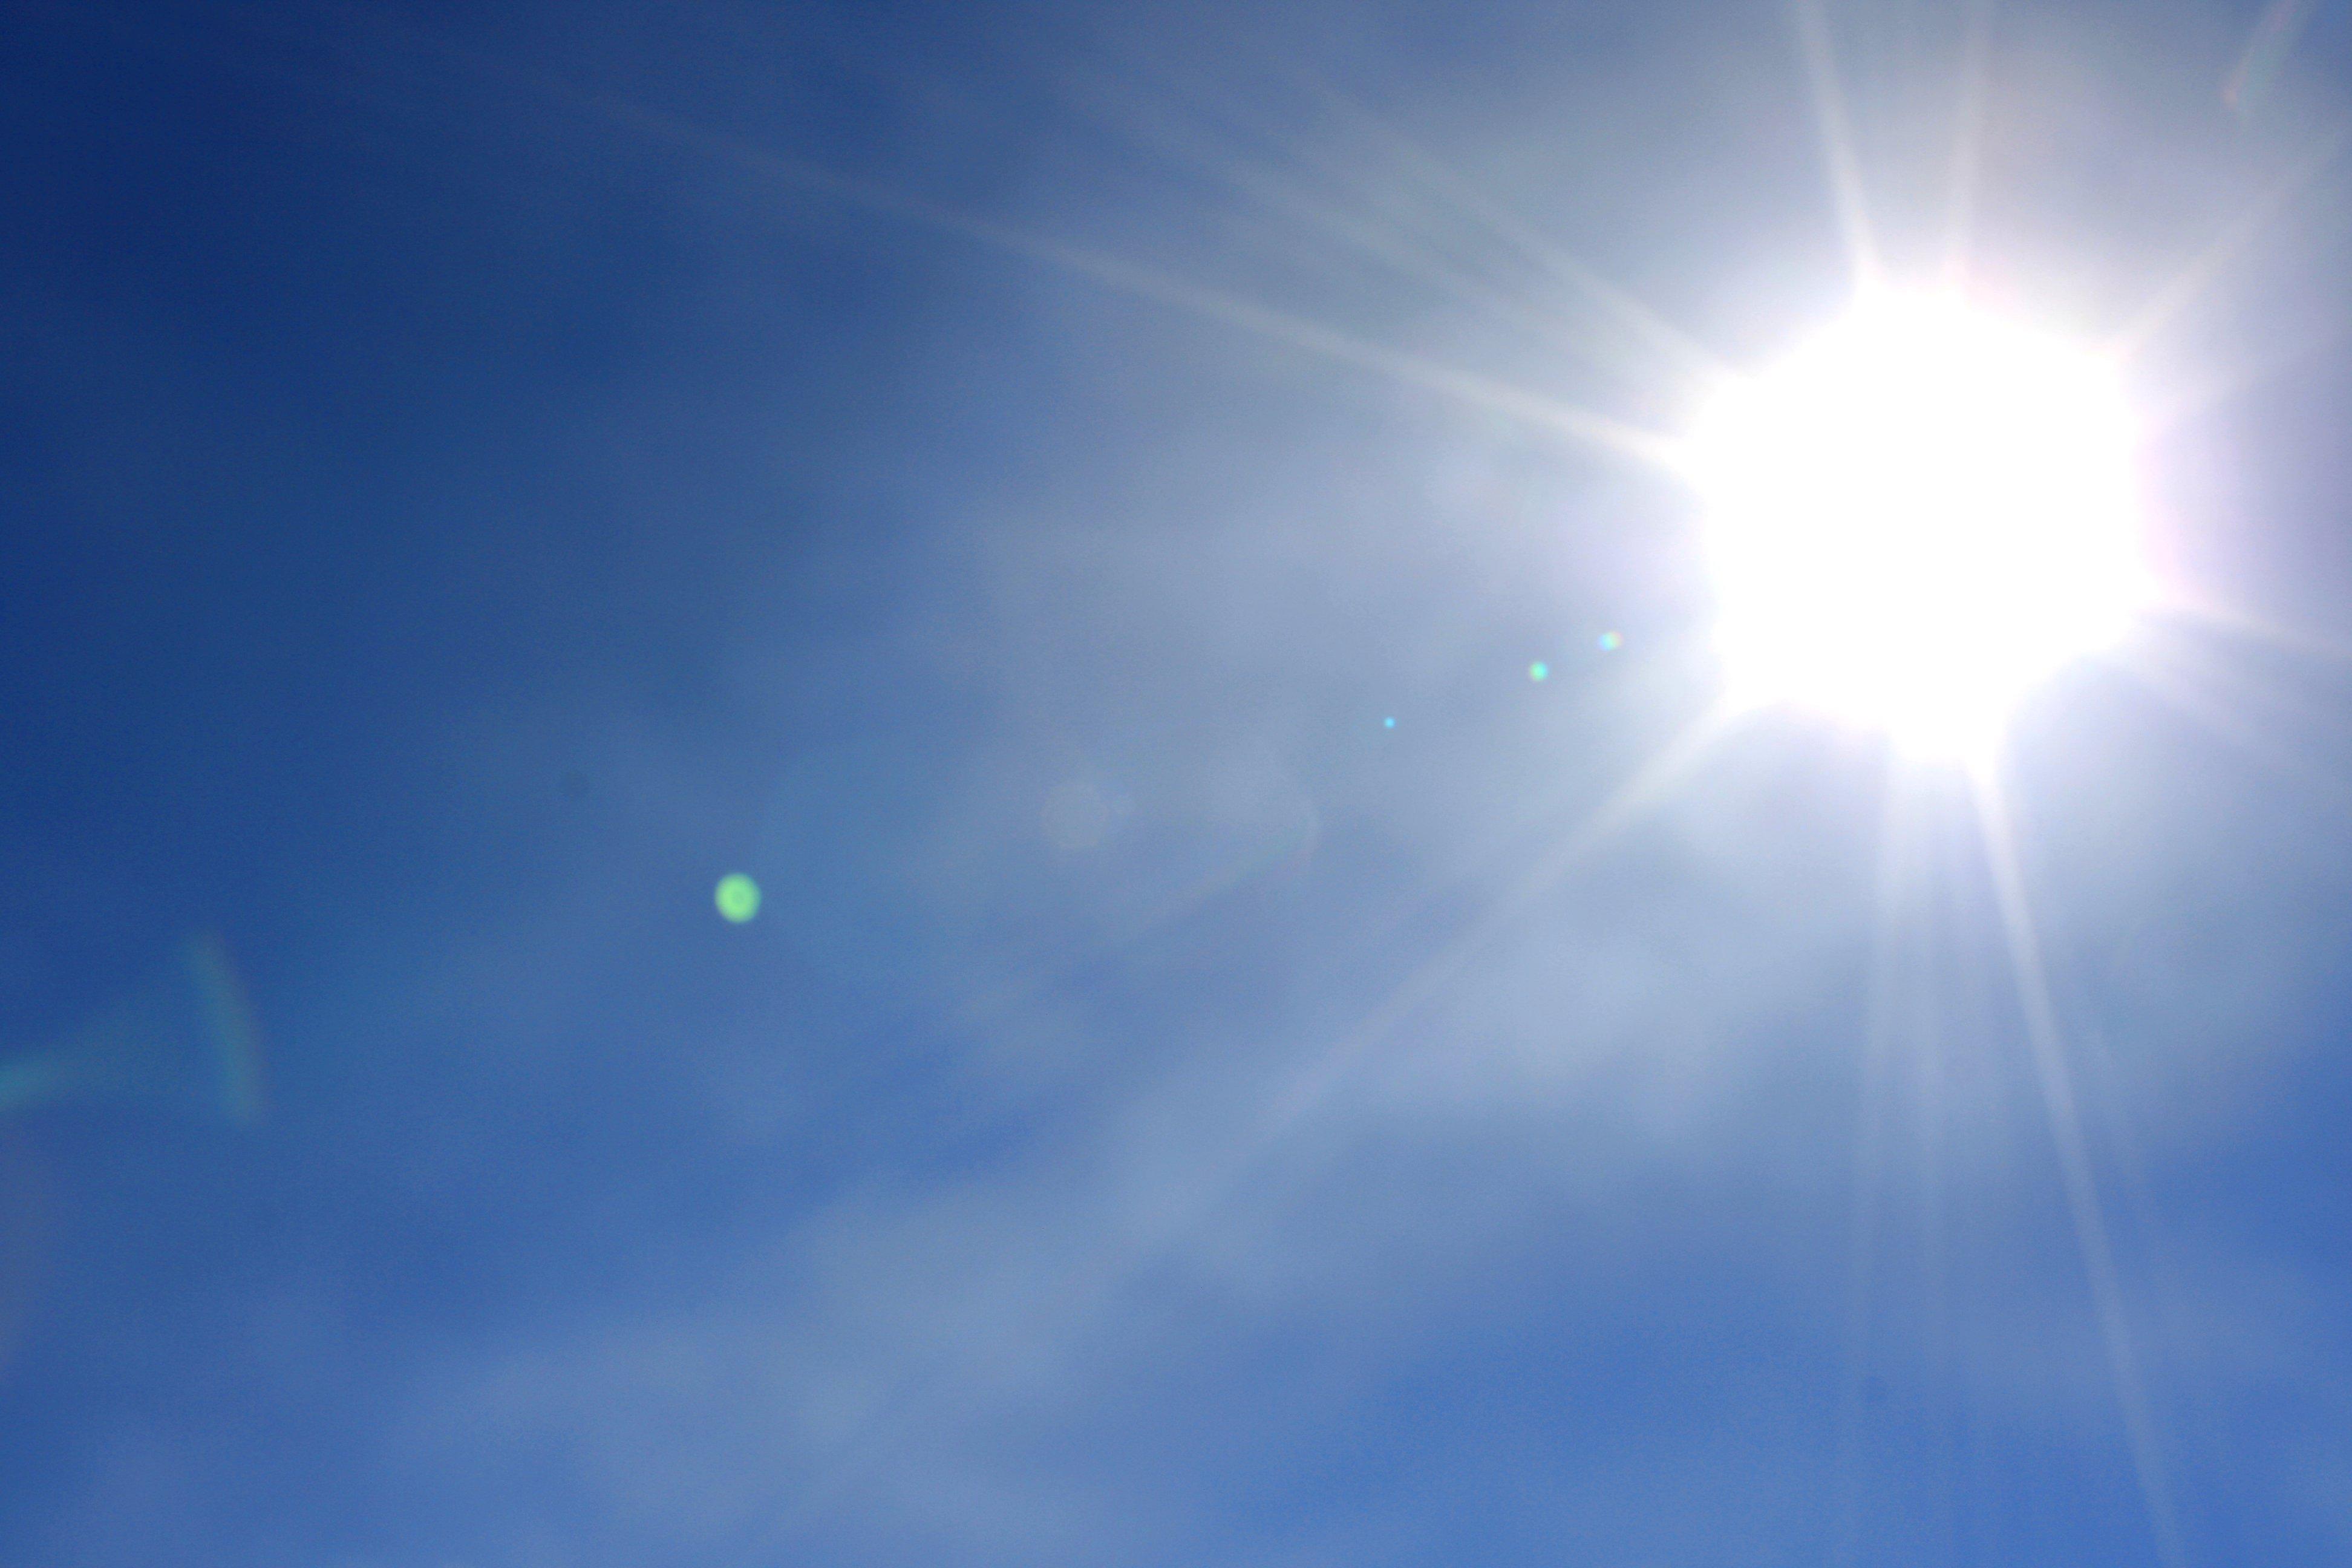 bright-sun-in-blue-sky